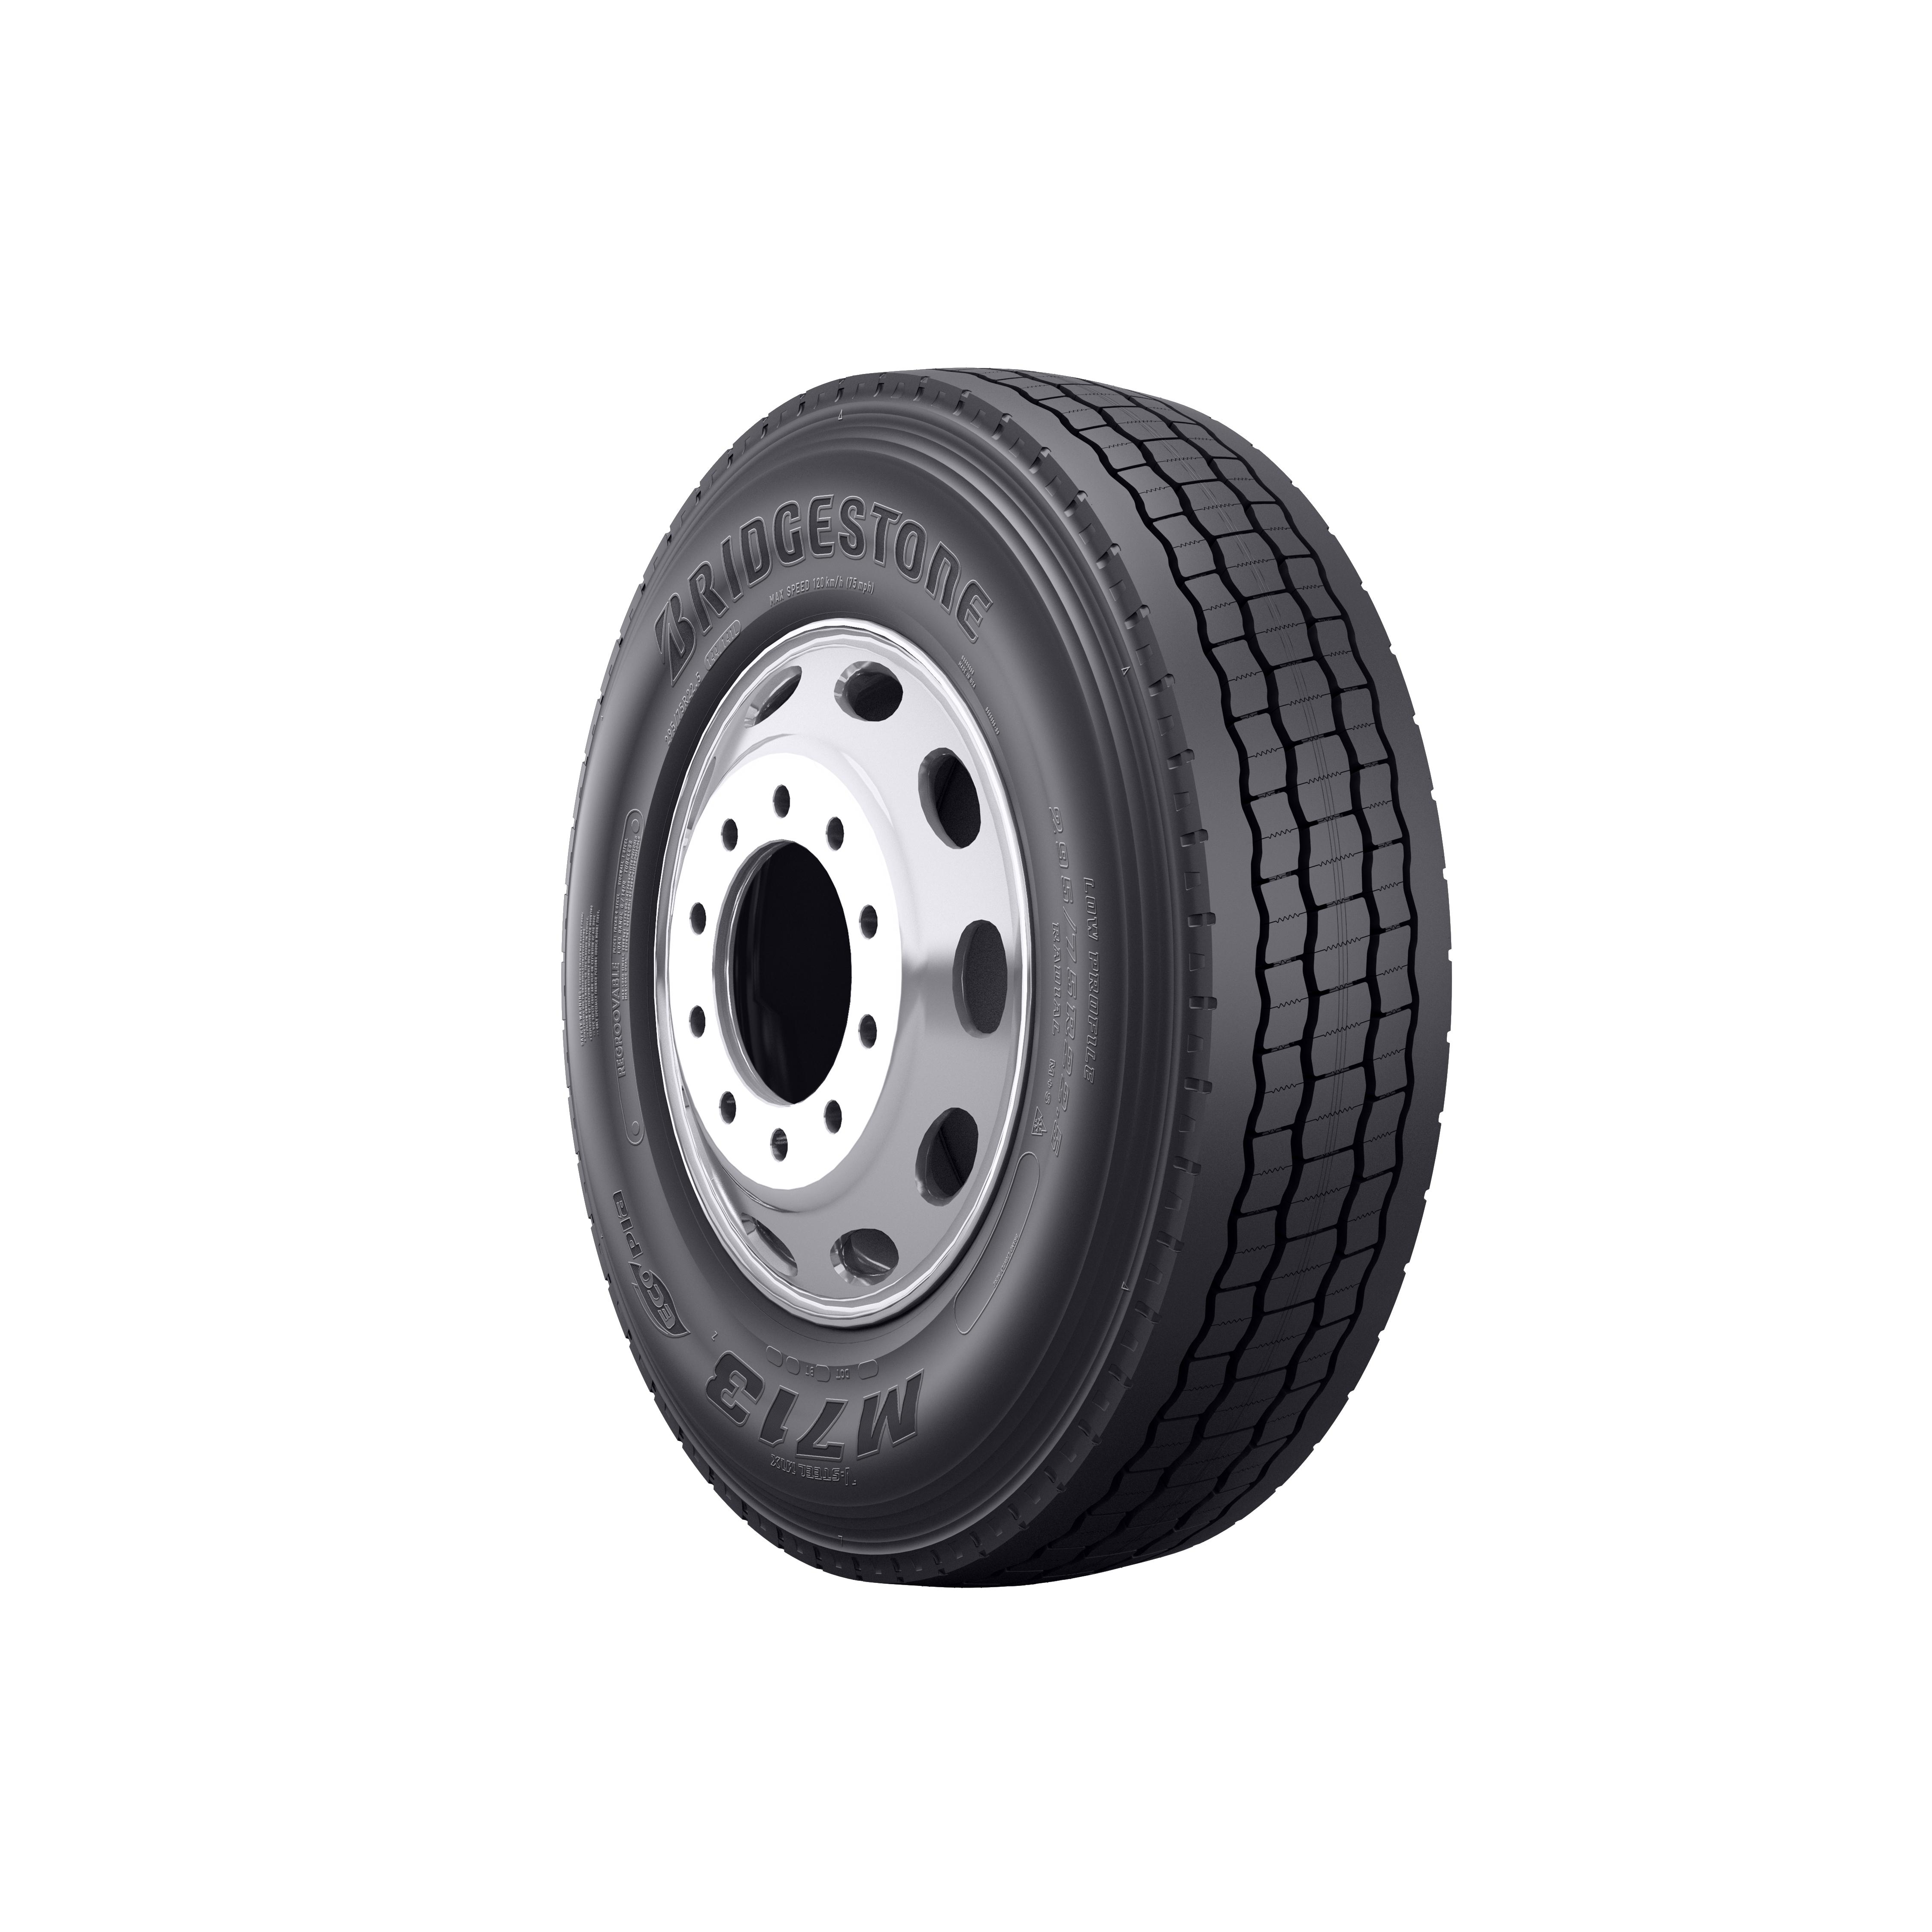 Bridgestone Introduces New Ecopia Truck Tire